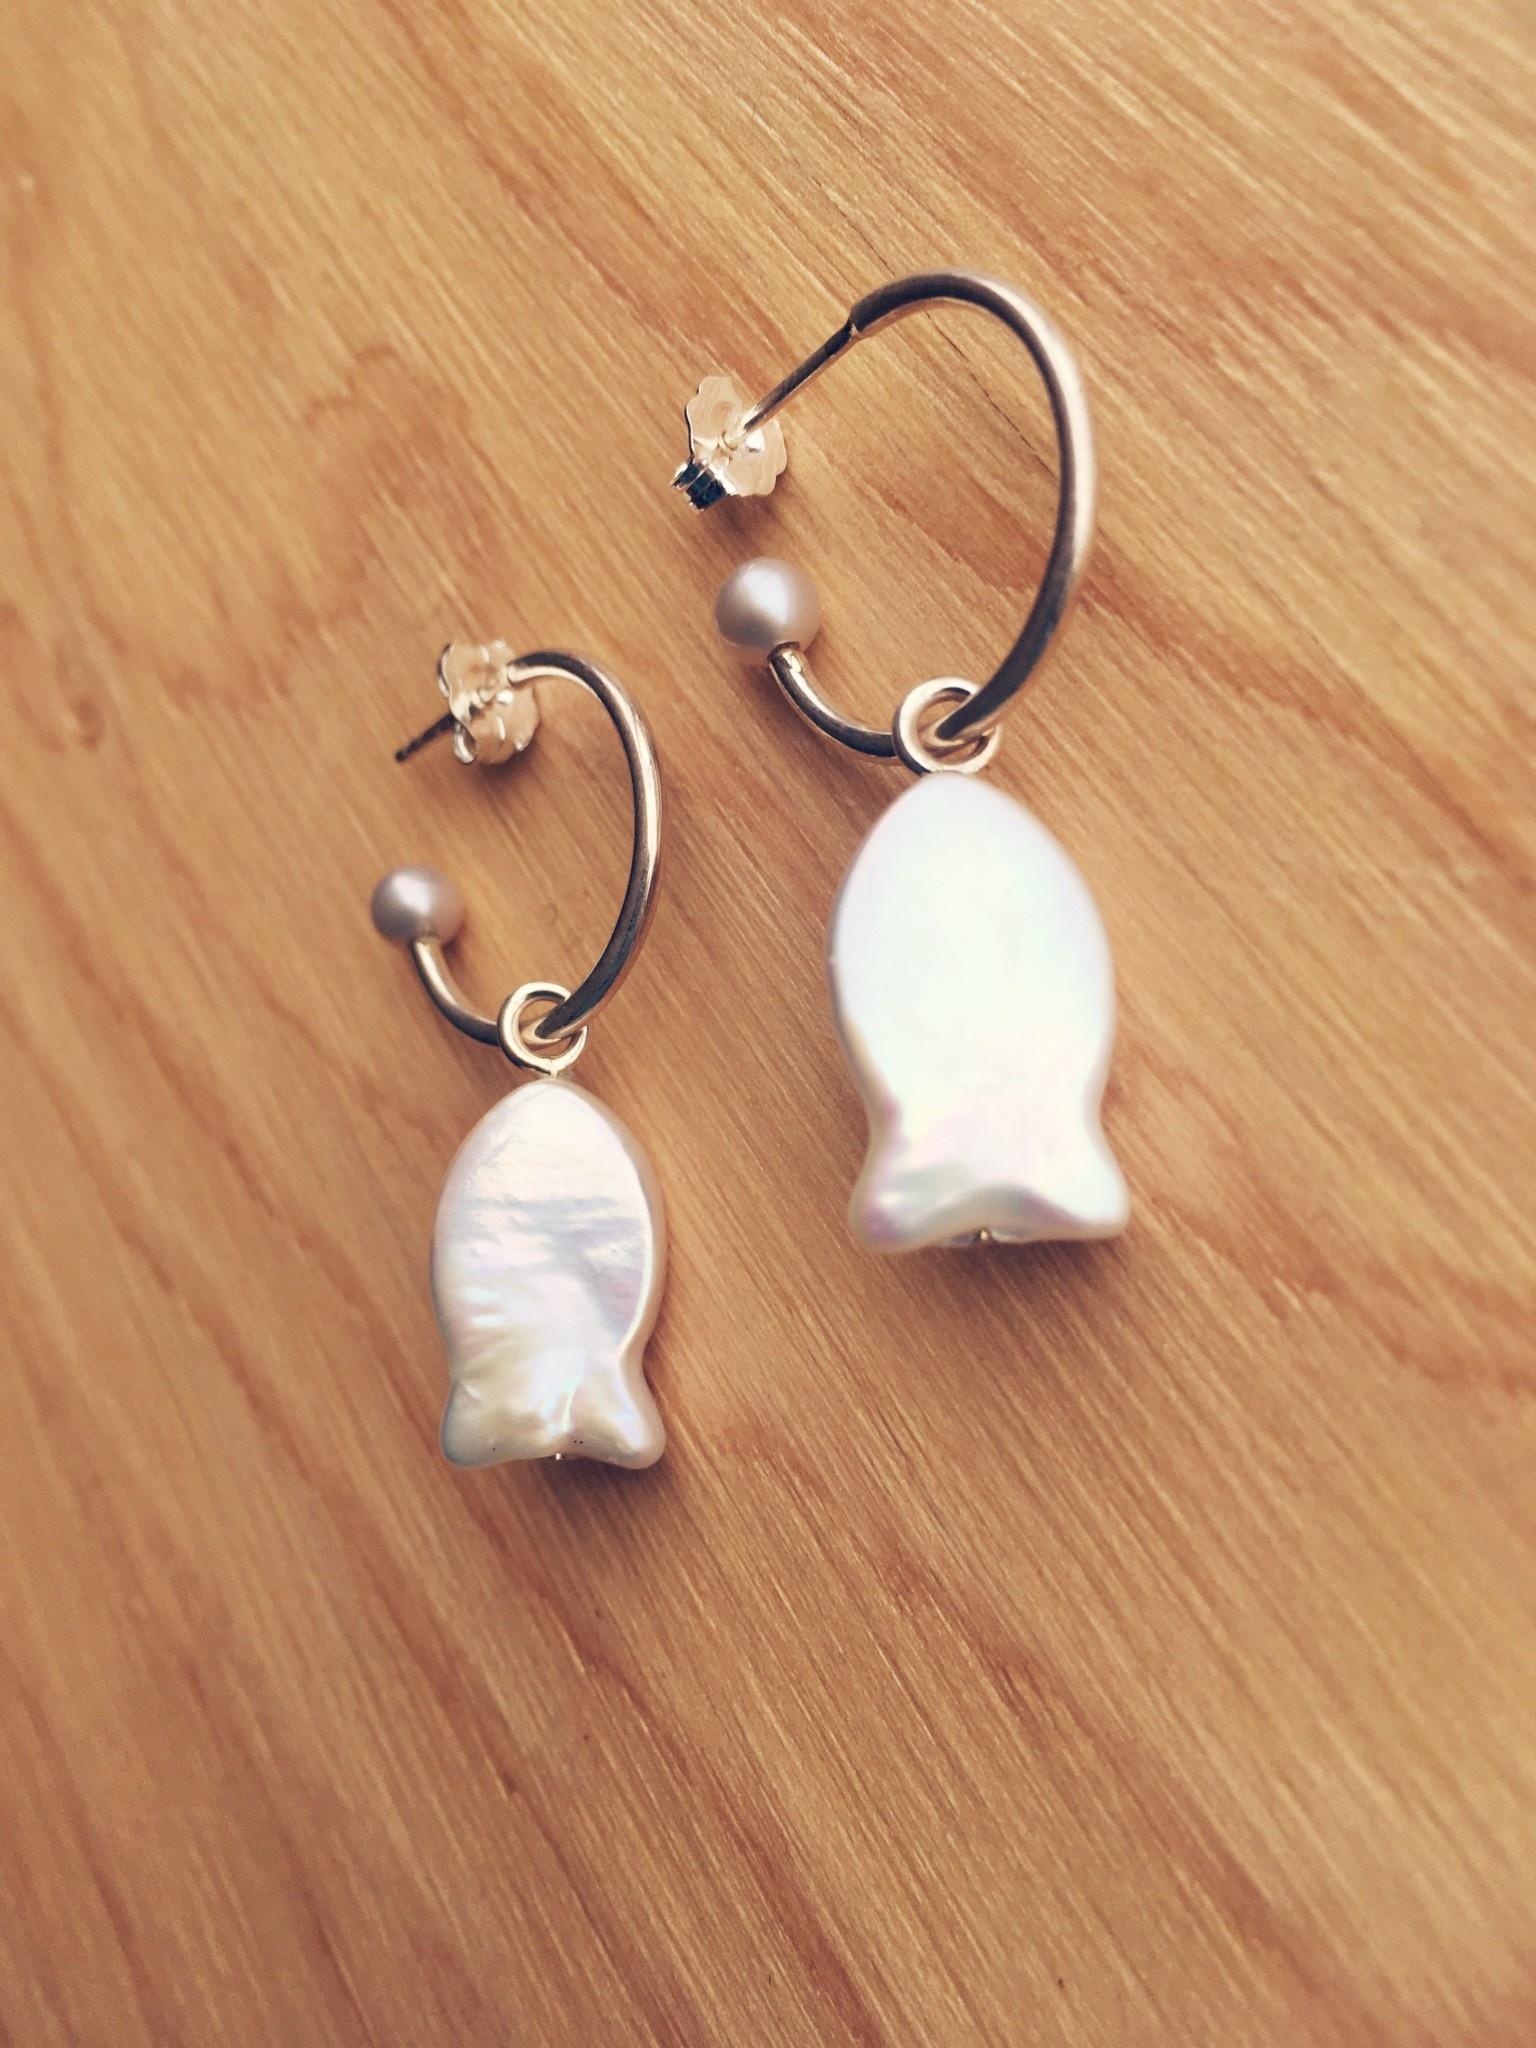 Nikki Nikki Fish Charm Earrings